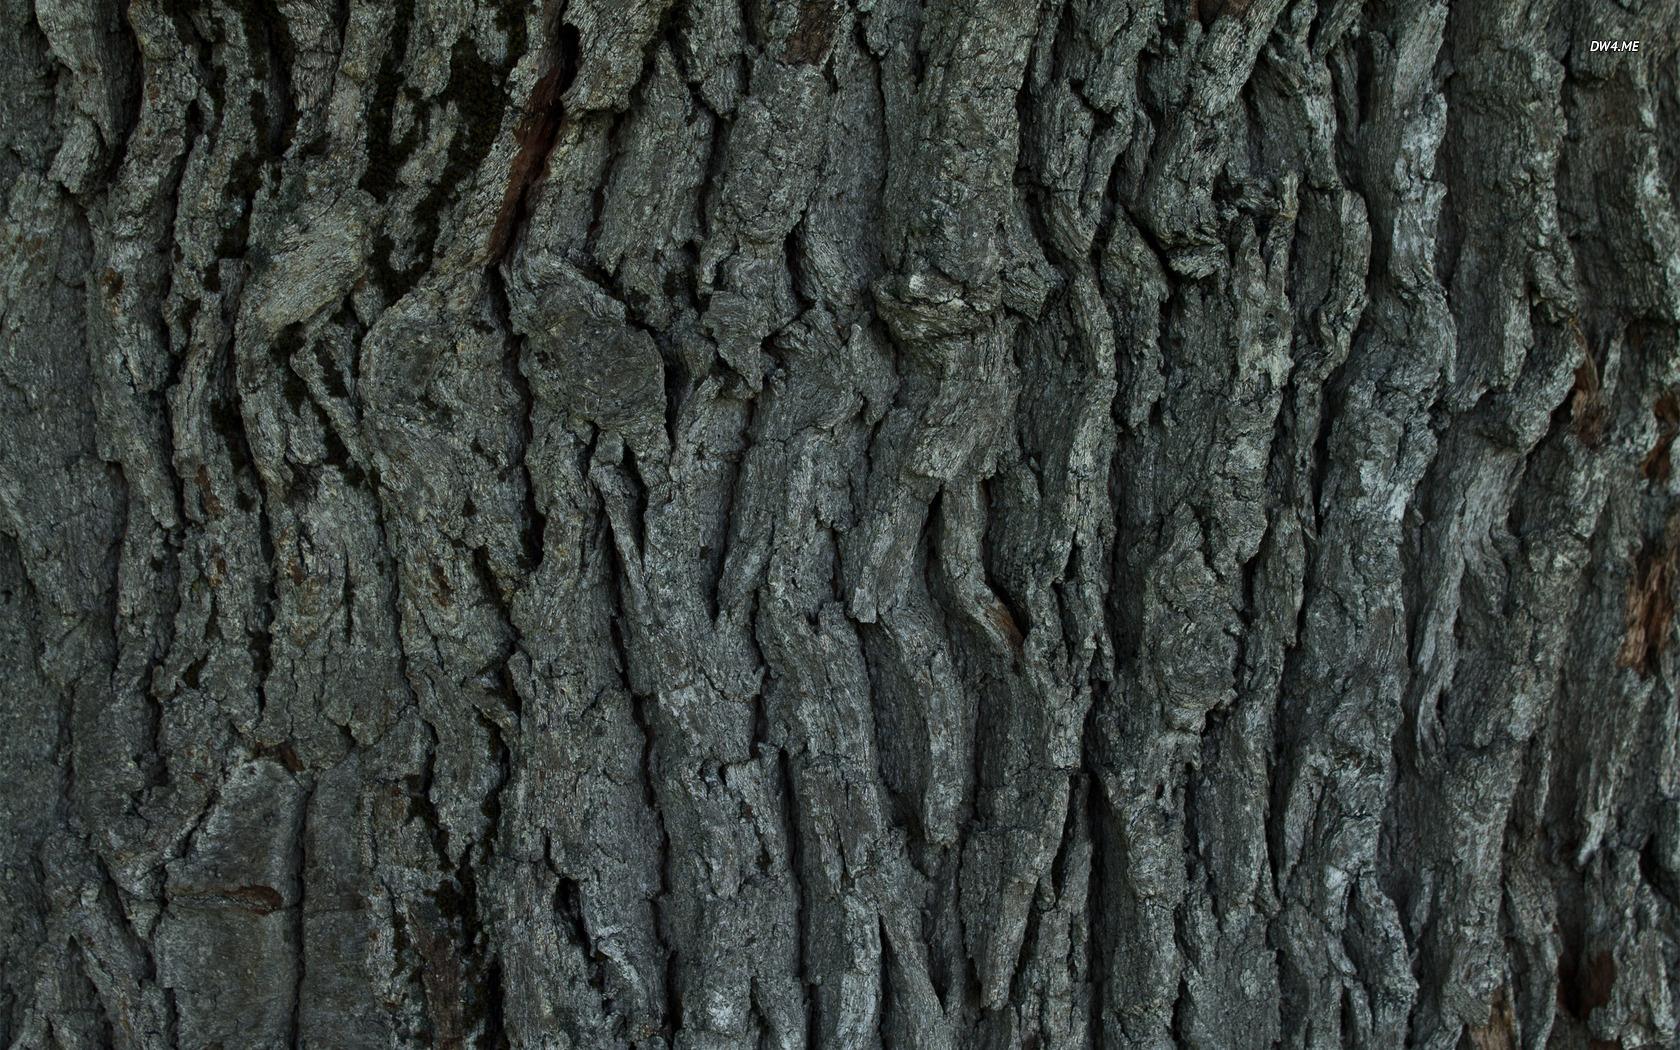 Tree bark wallpaper 1920x1080 Tree bark wallpaper 1920x1200 Tree bark 1680x1050